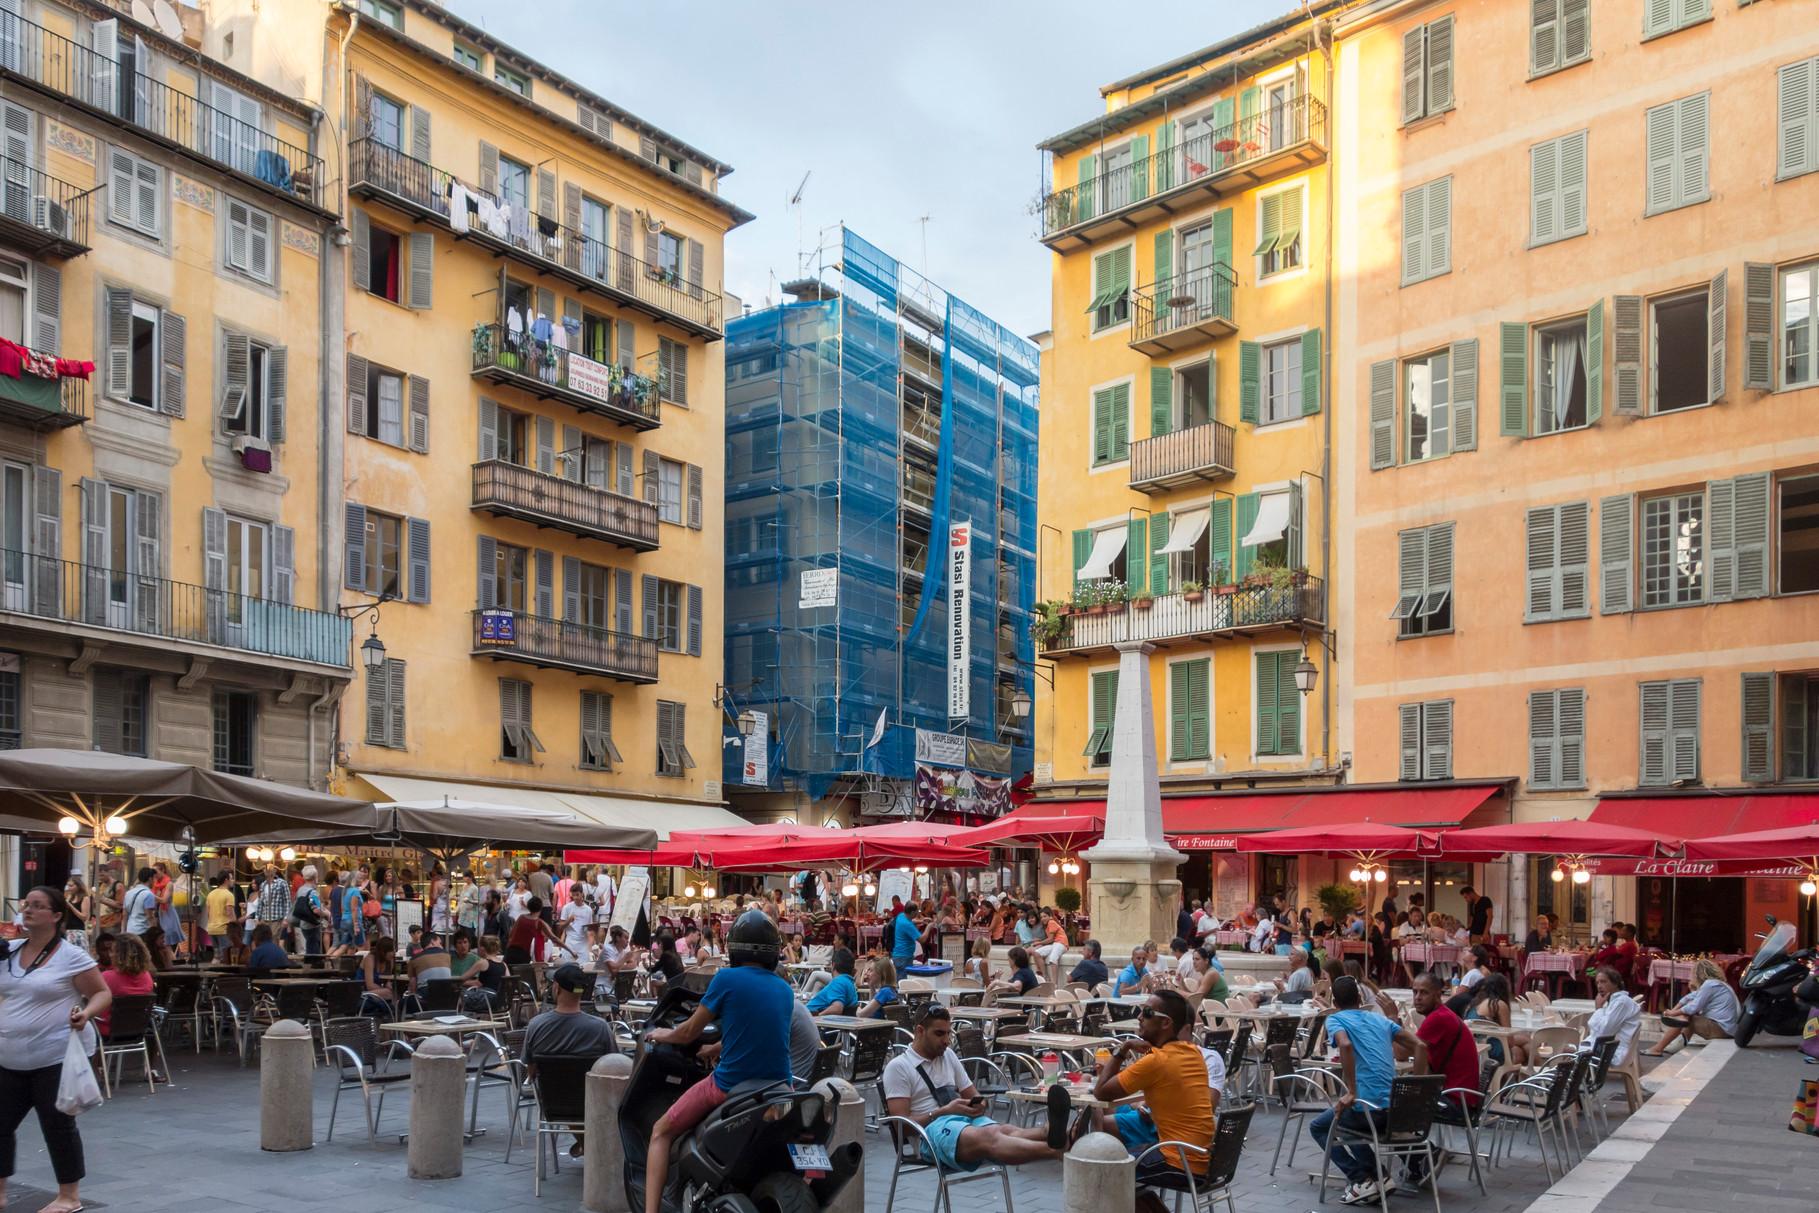 Place Rosetti im Zentrum der Altstadt